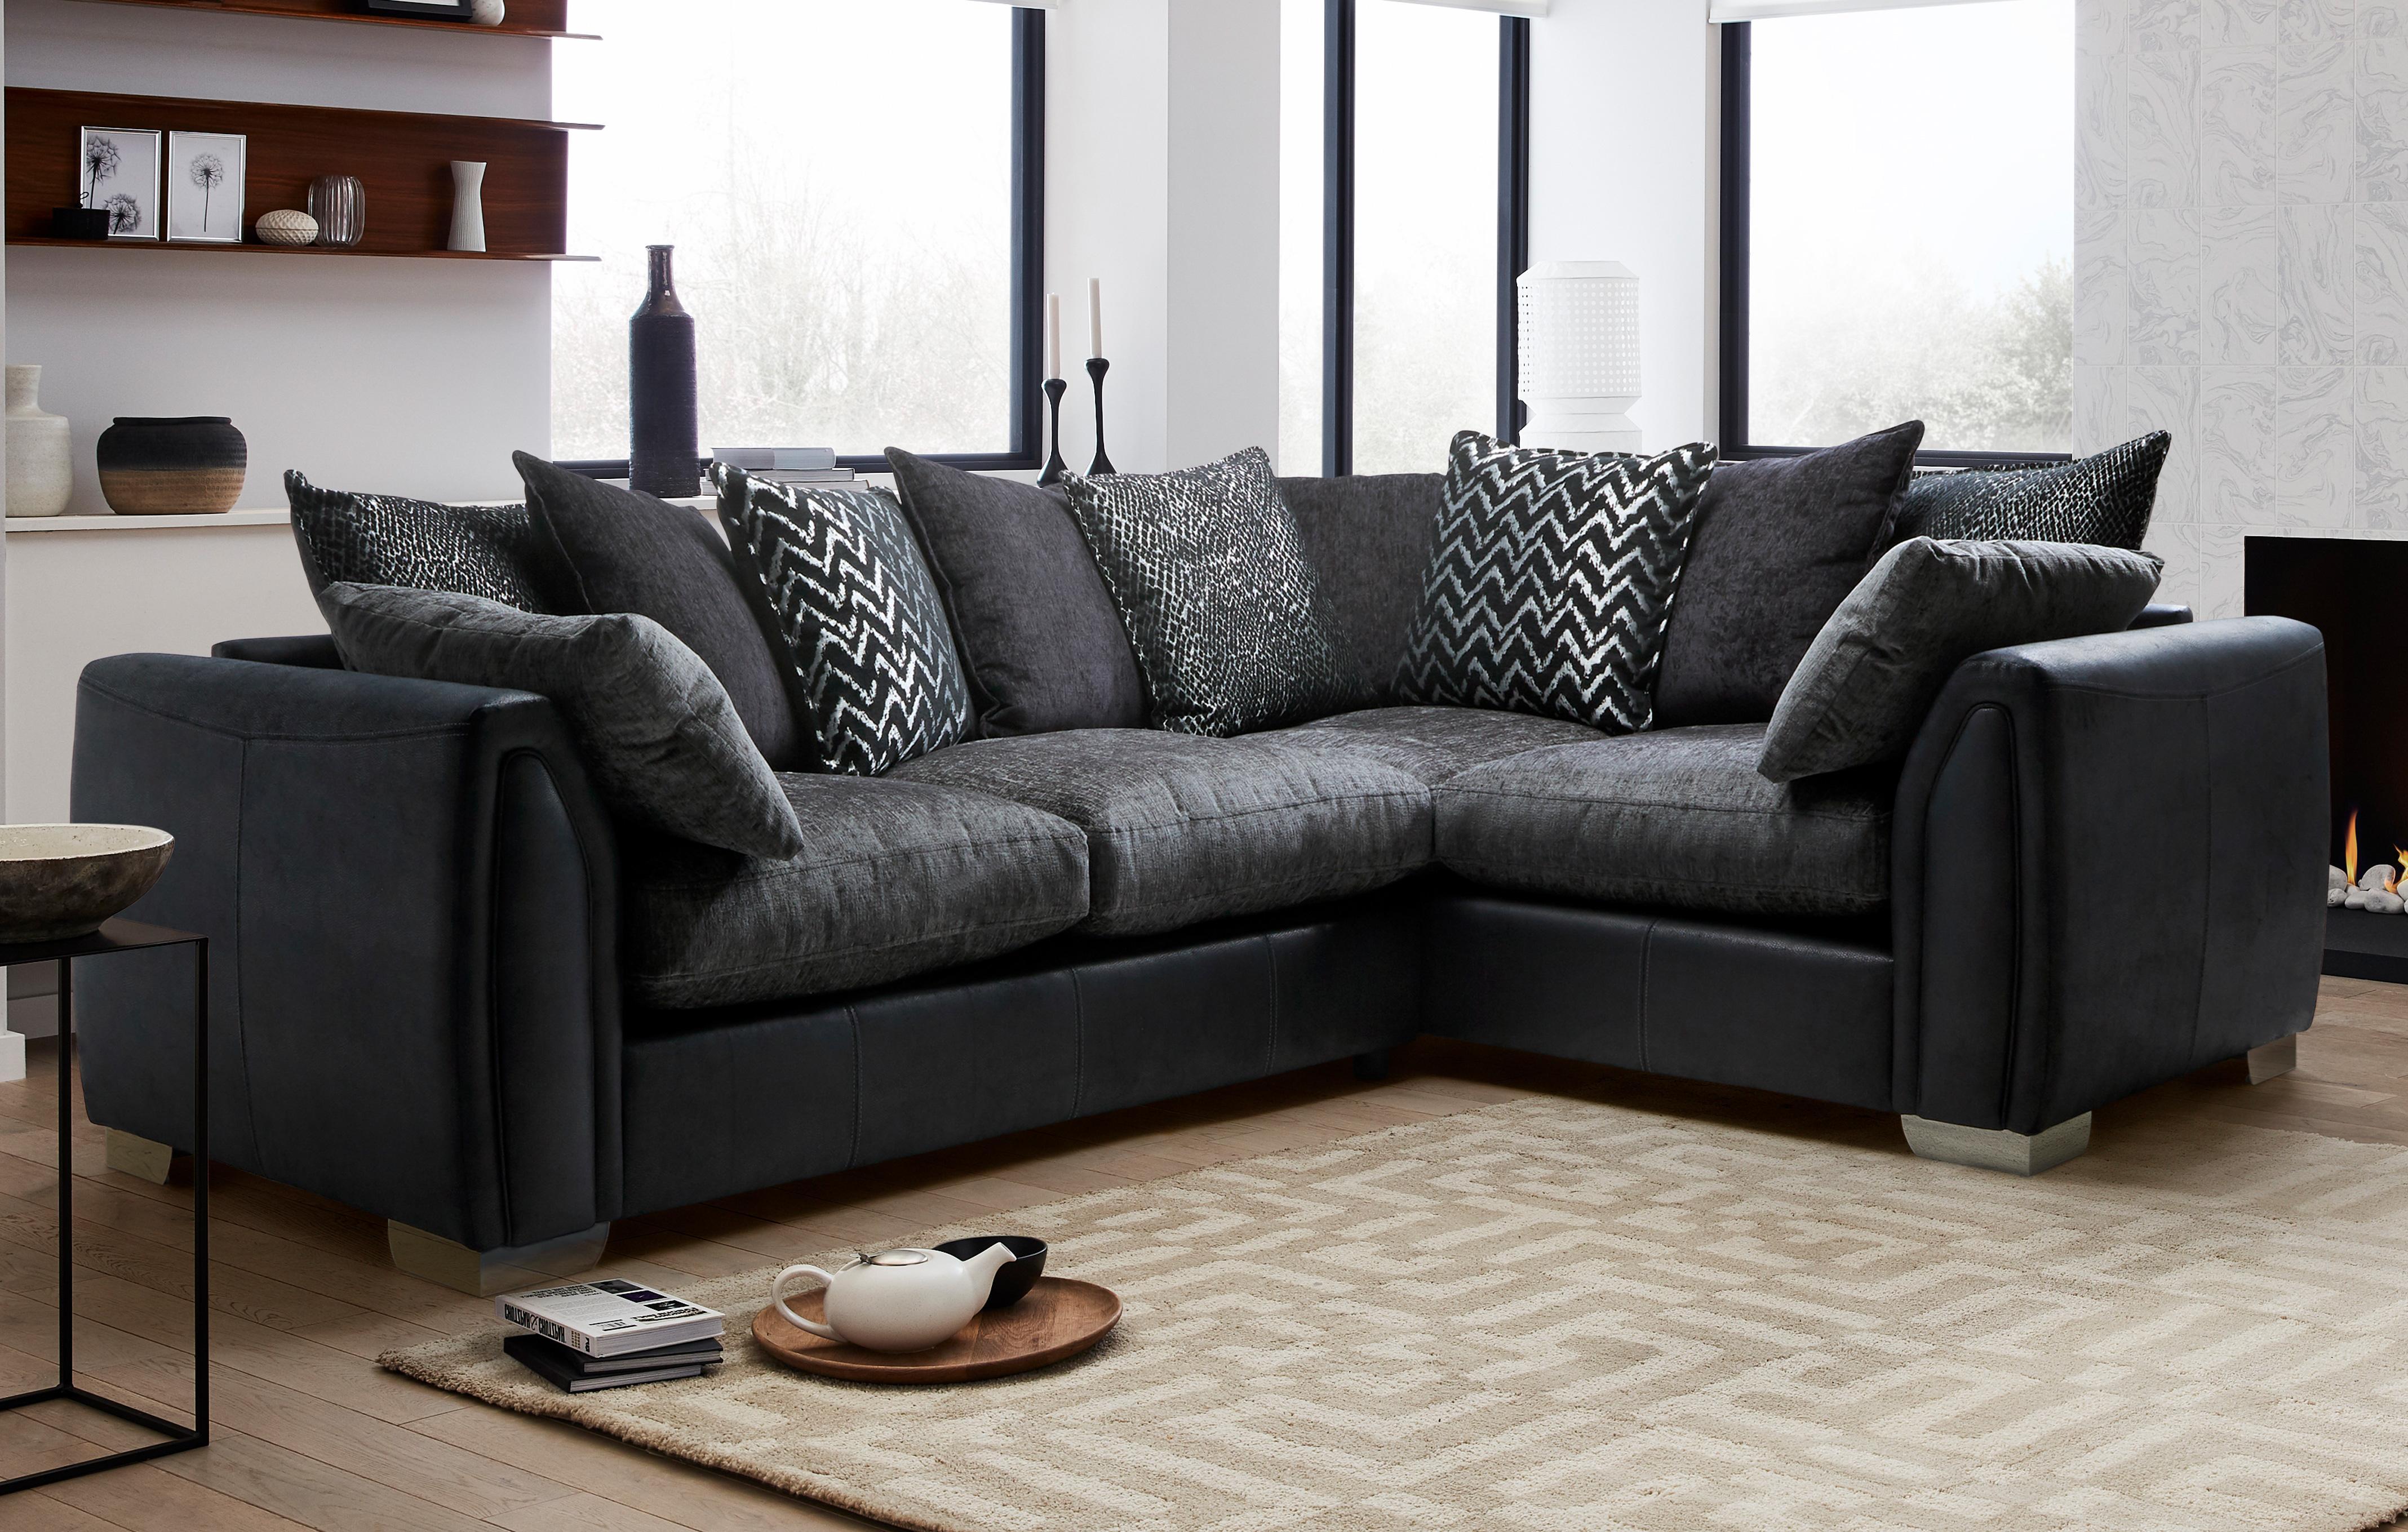 Corner Sofa Sales And Deals Across The Full Range Ireland | DFS Ireland